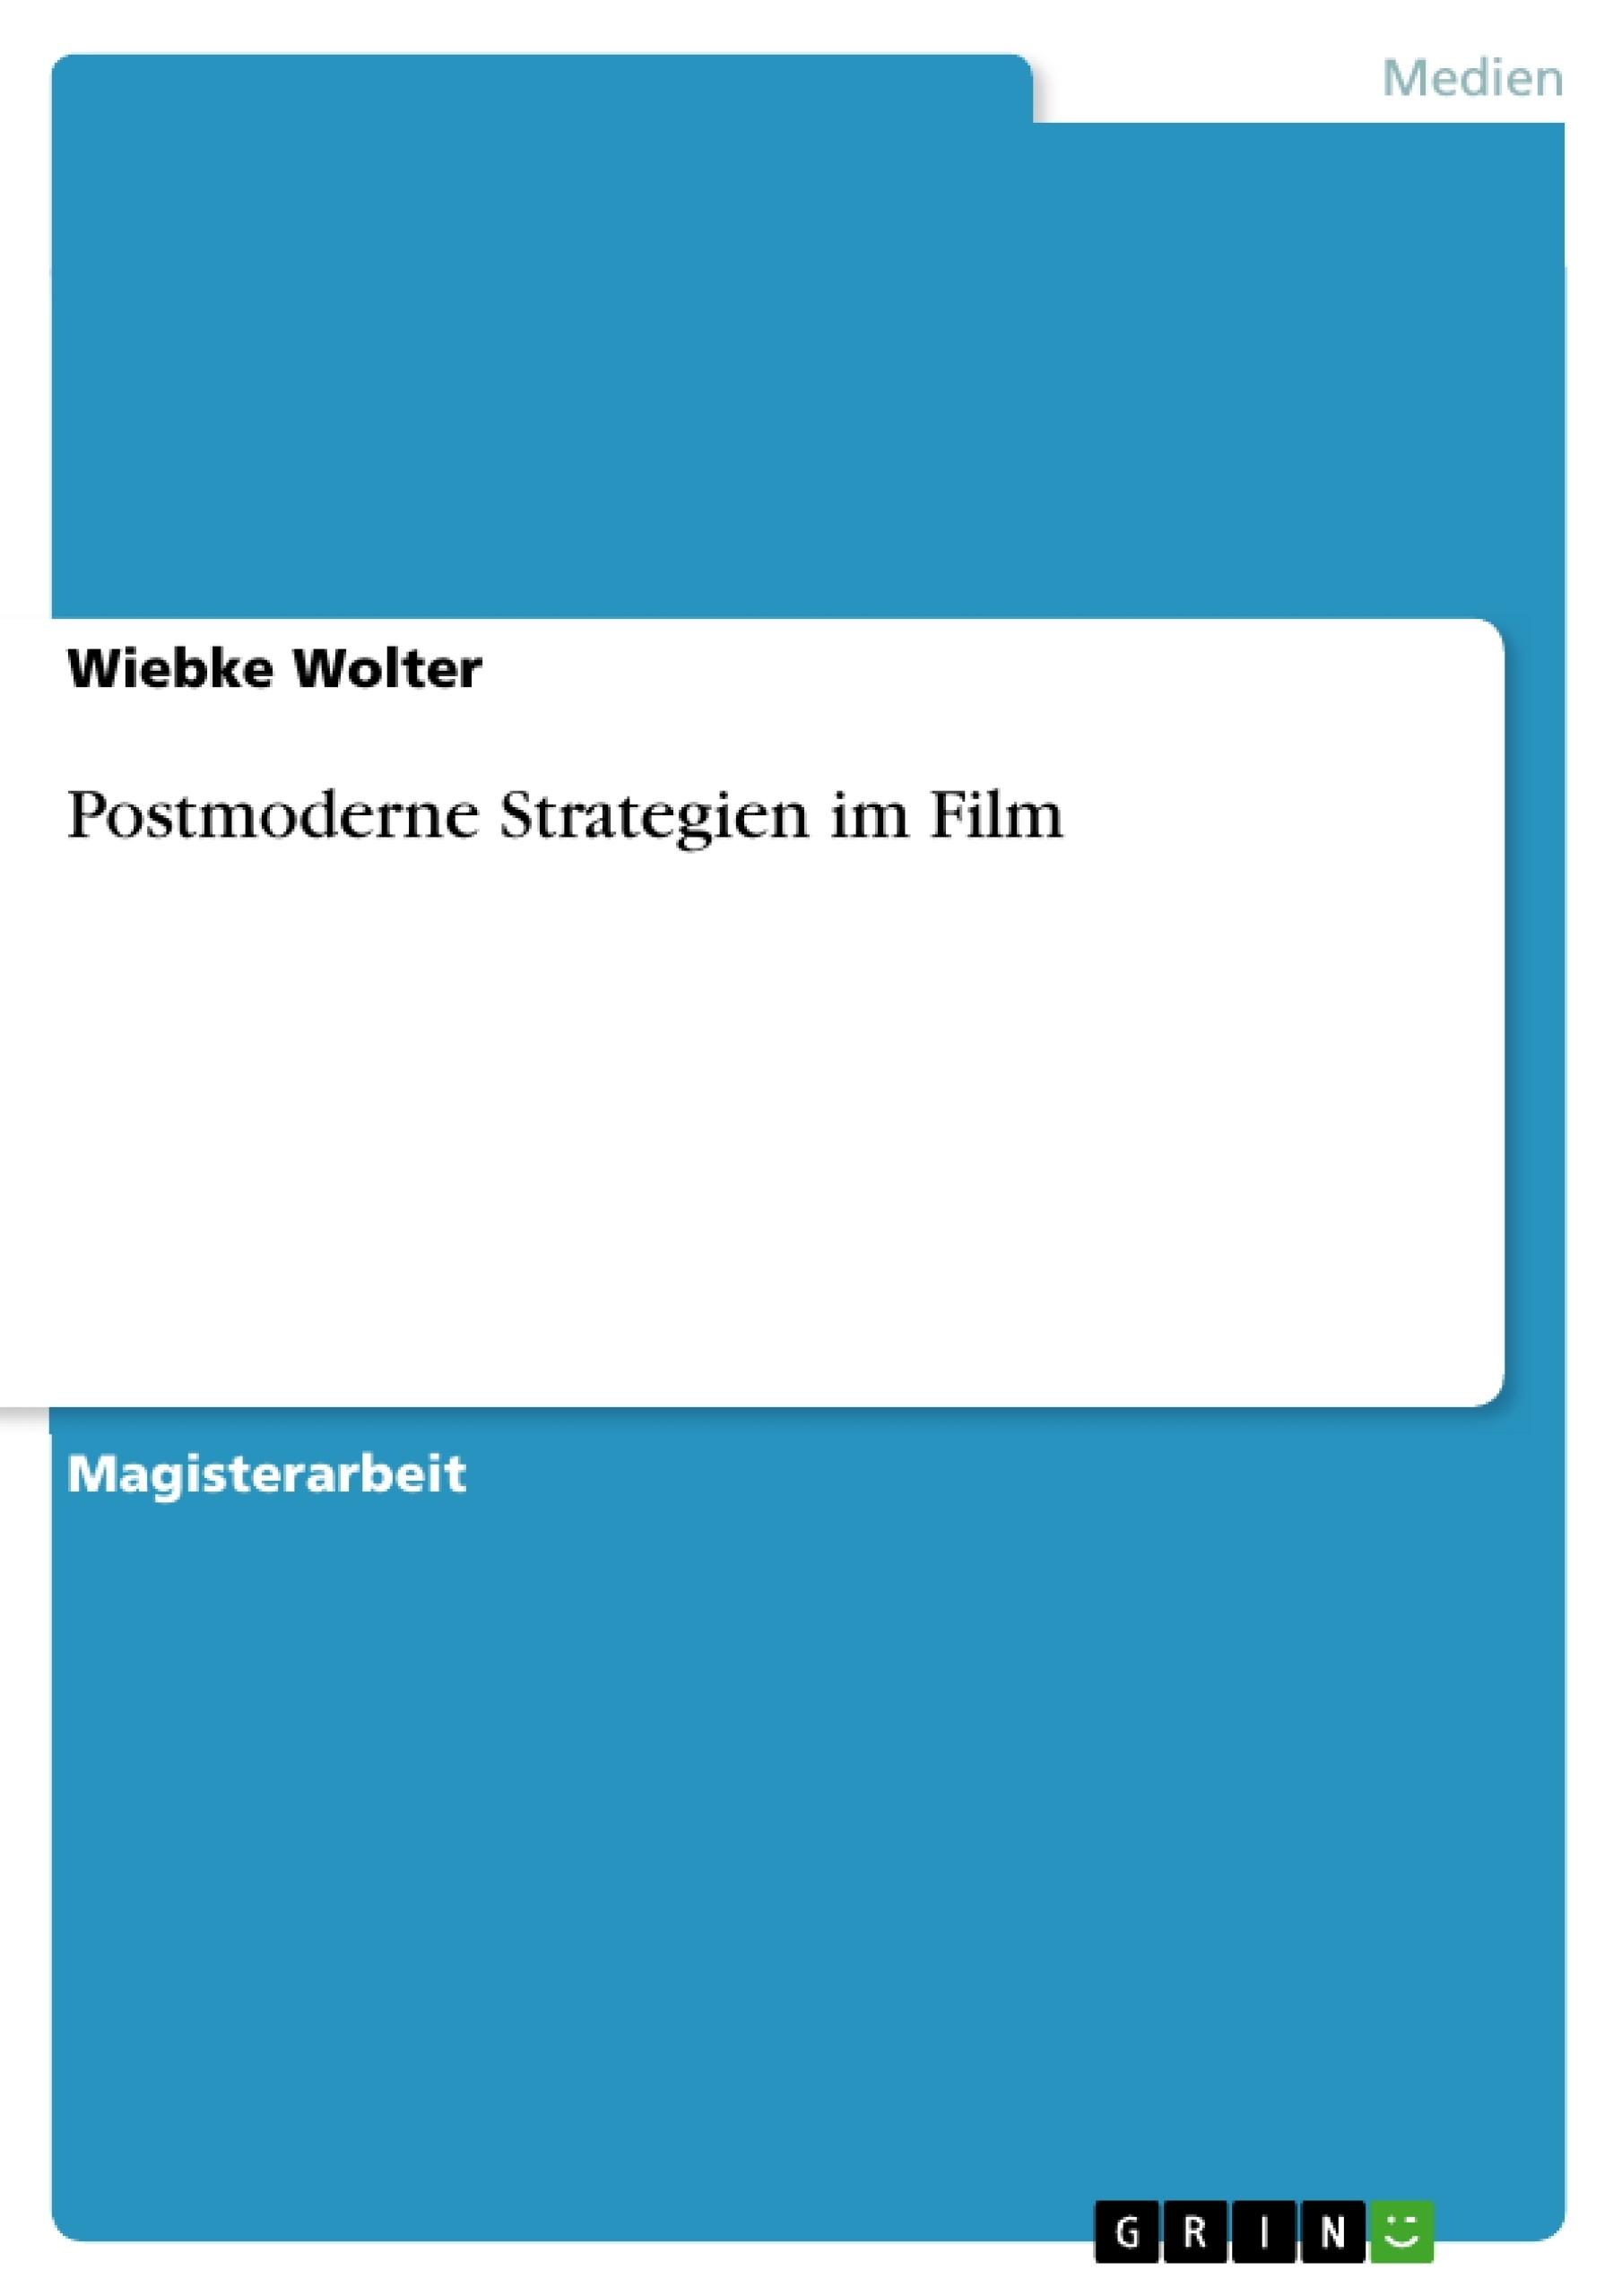 Titel: Postmoderne Strategien im Film